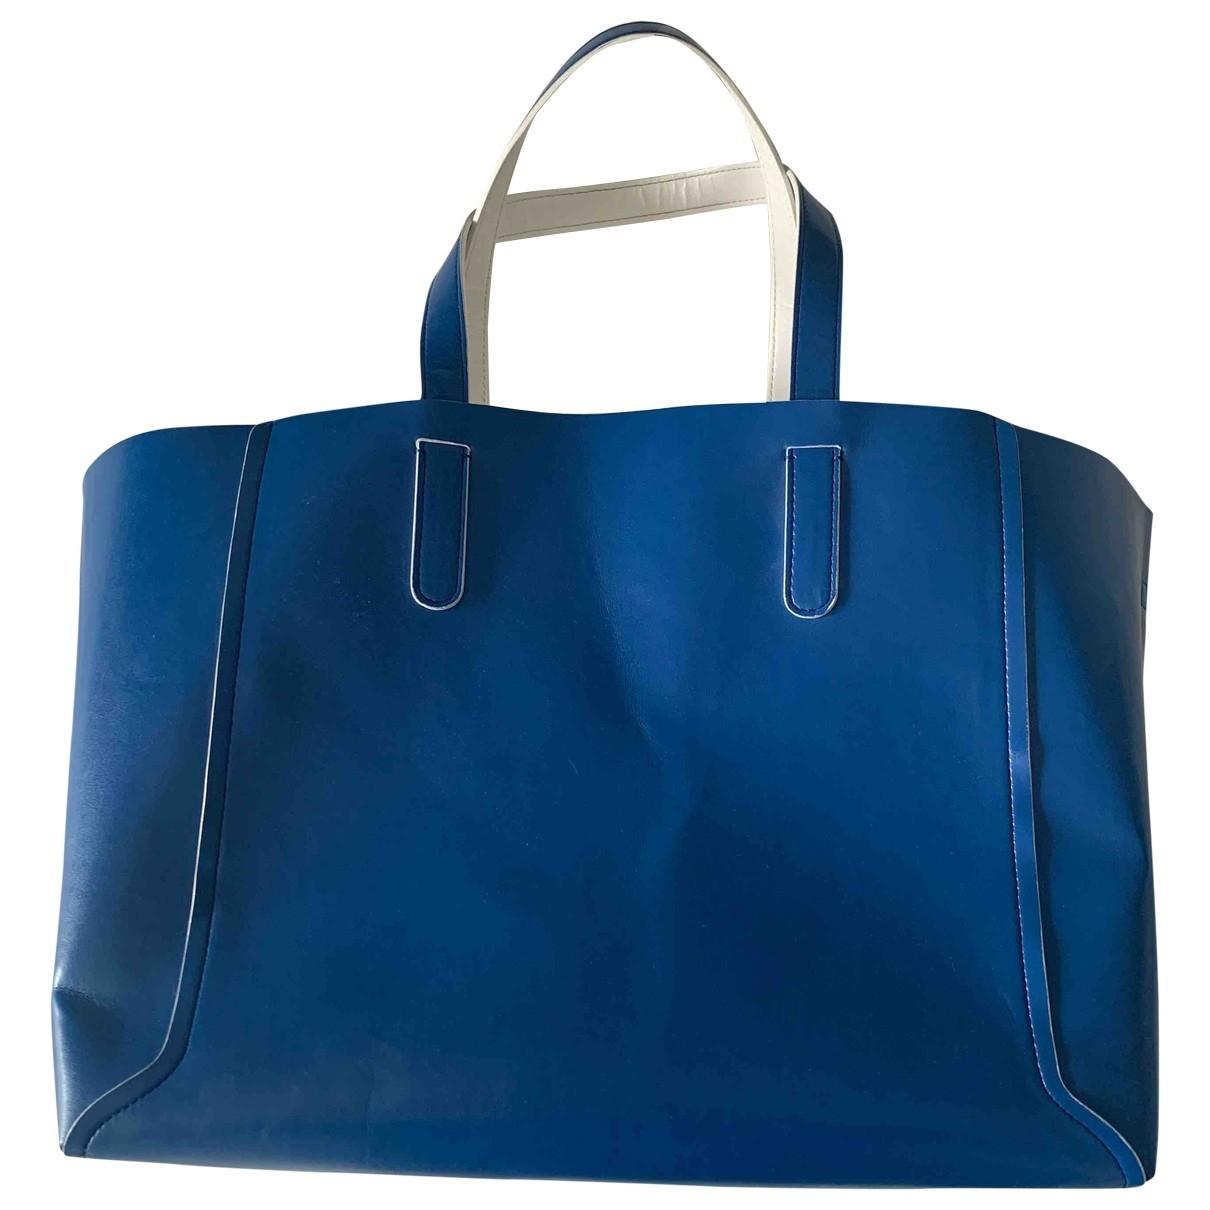 Gerard Darel - Sac a main Simple Bag pour femme en cuir - bleu